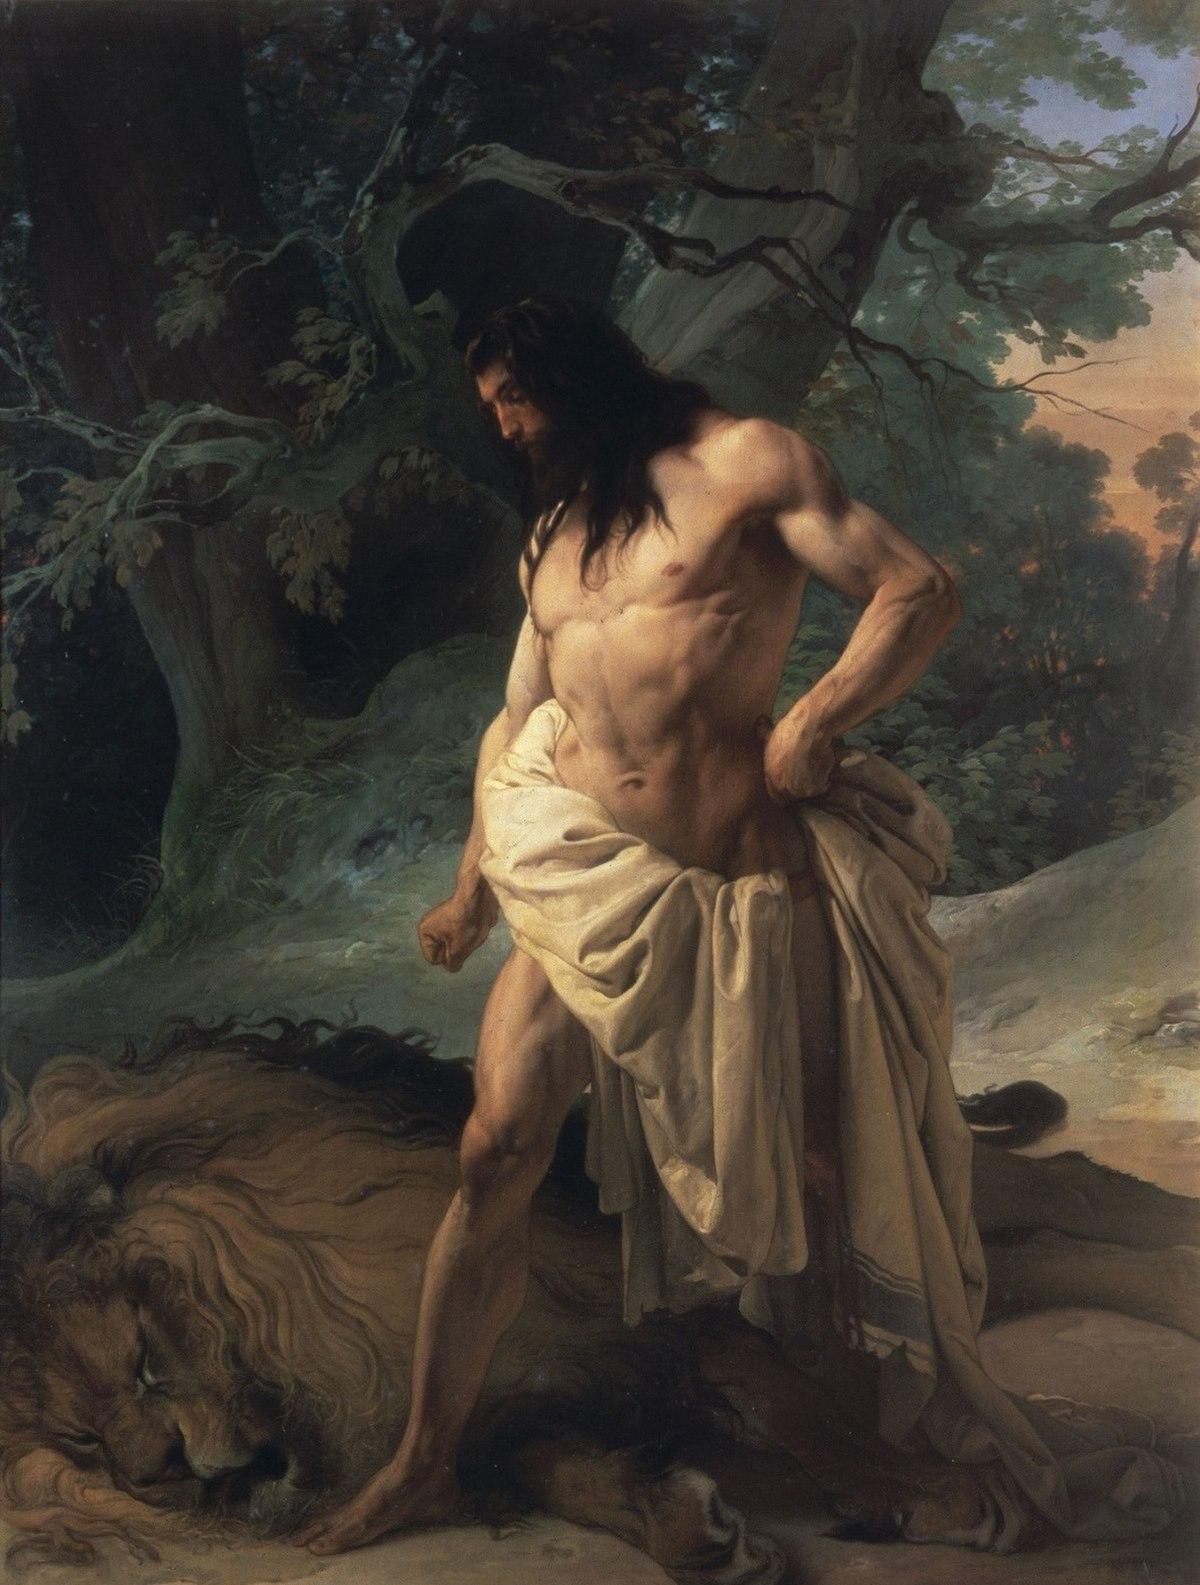 Sansón - Wikipedia, la enciclopedia libre